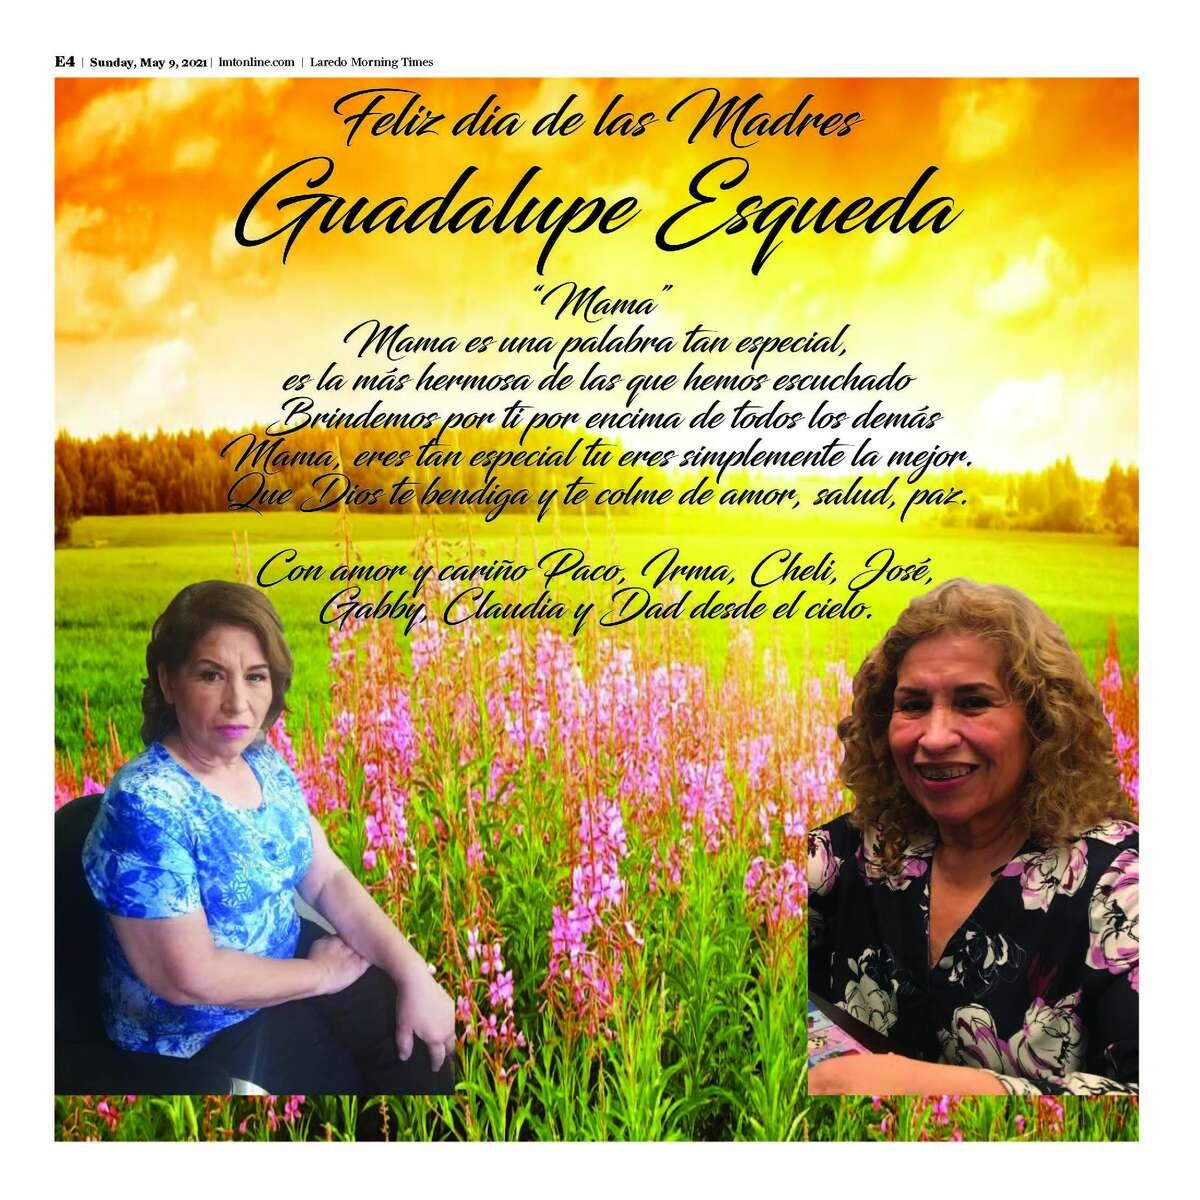 Laredoans celebrate Mom on Mother's Day.